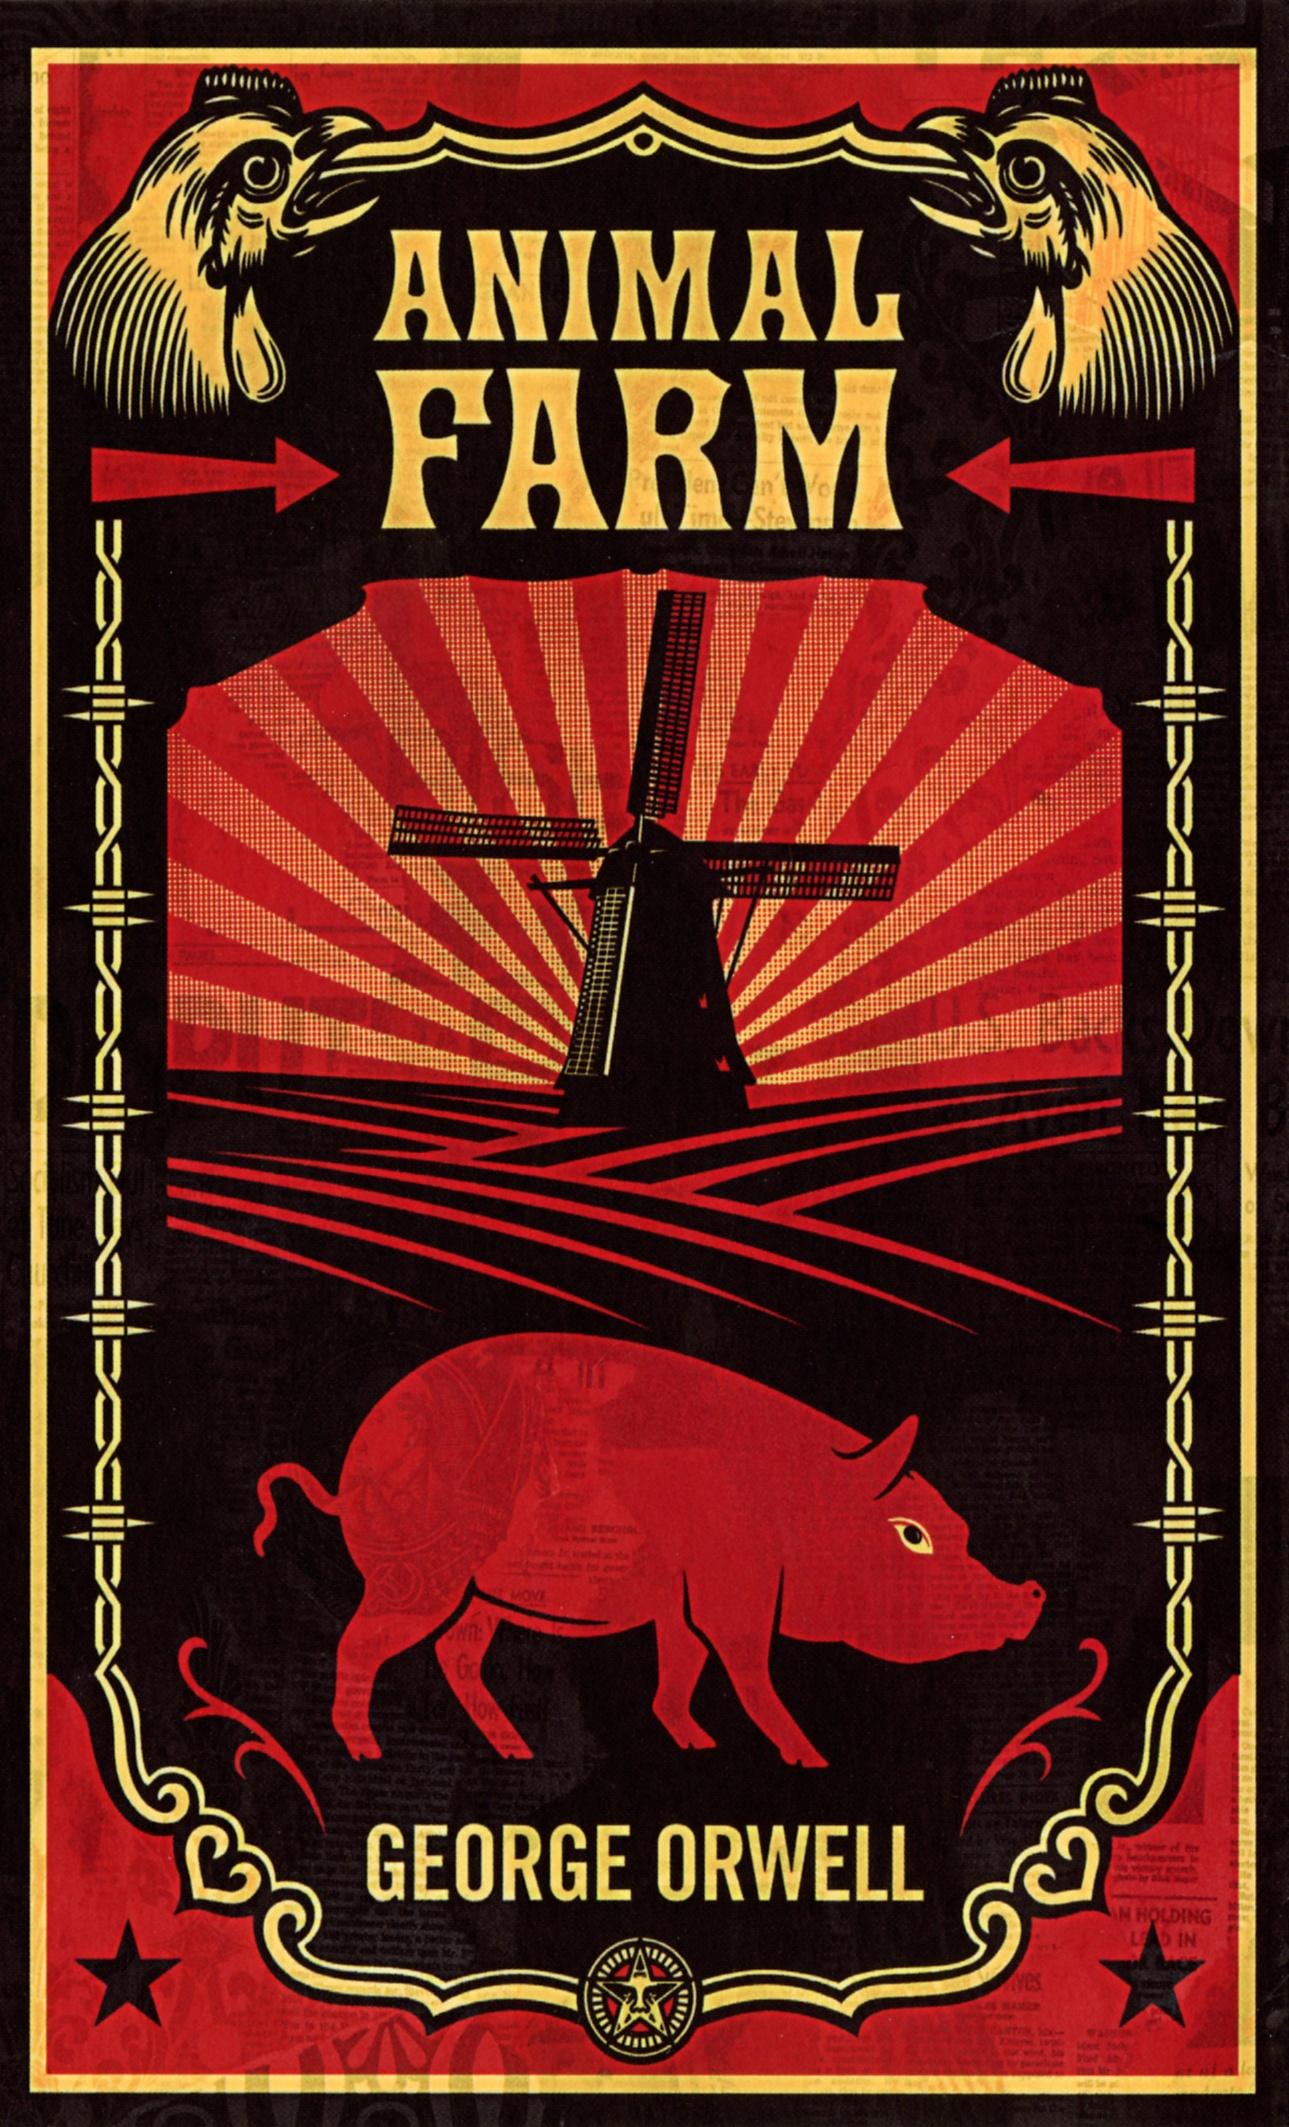 Boekcover Animal farm